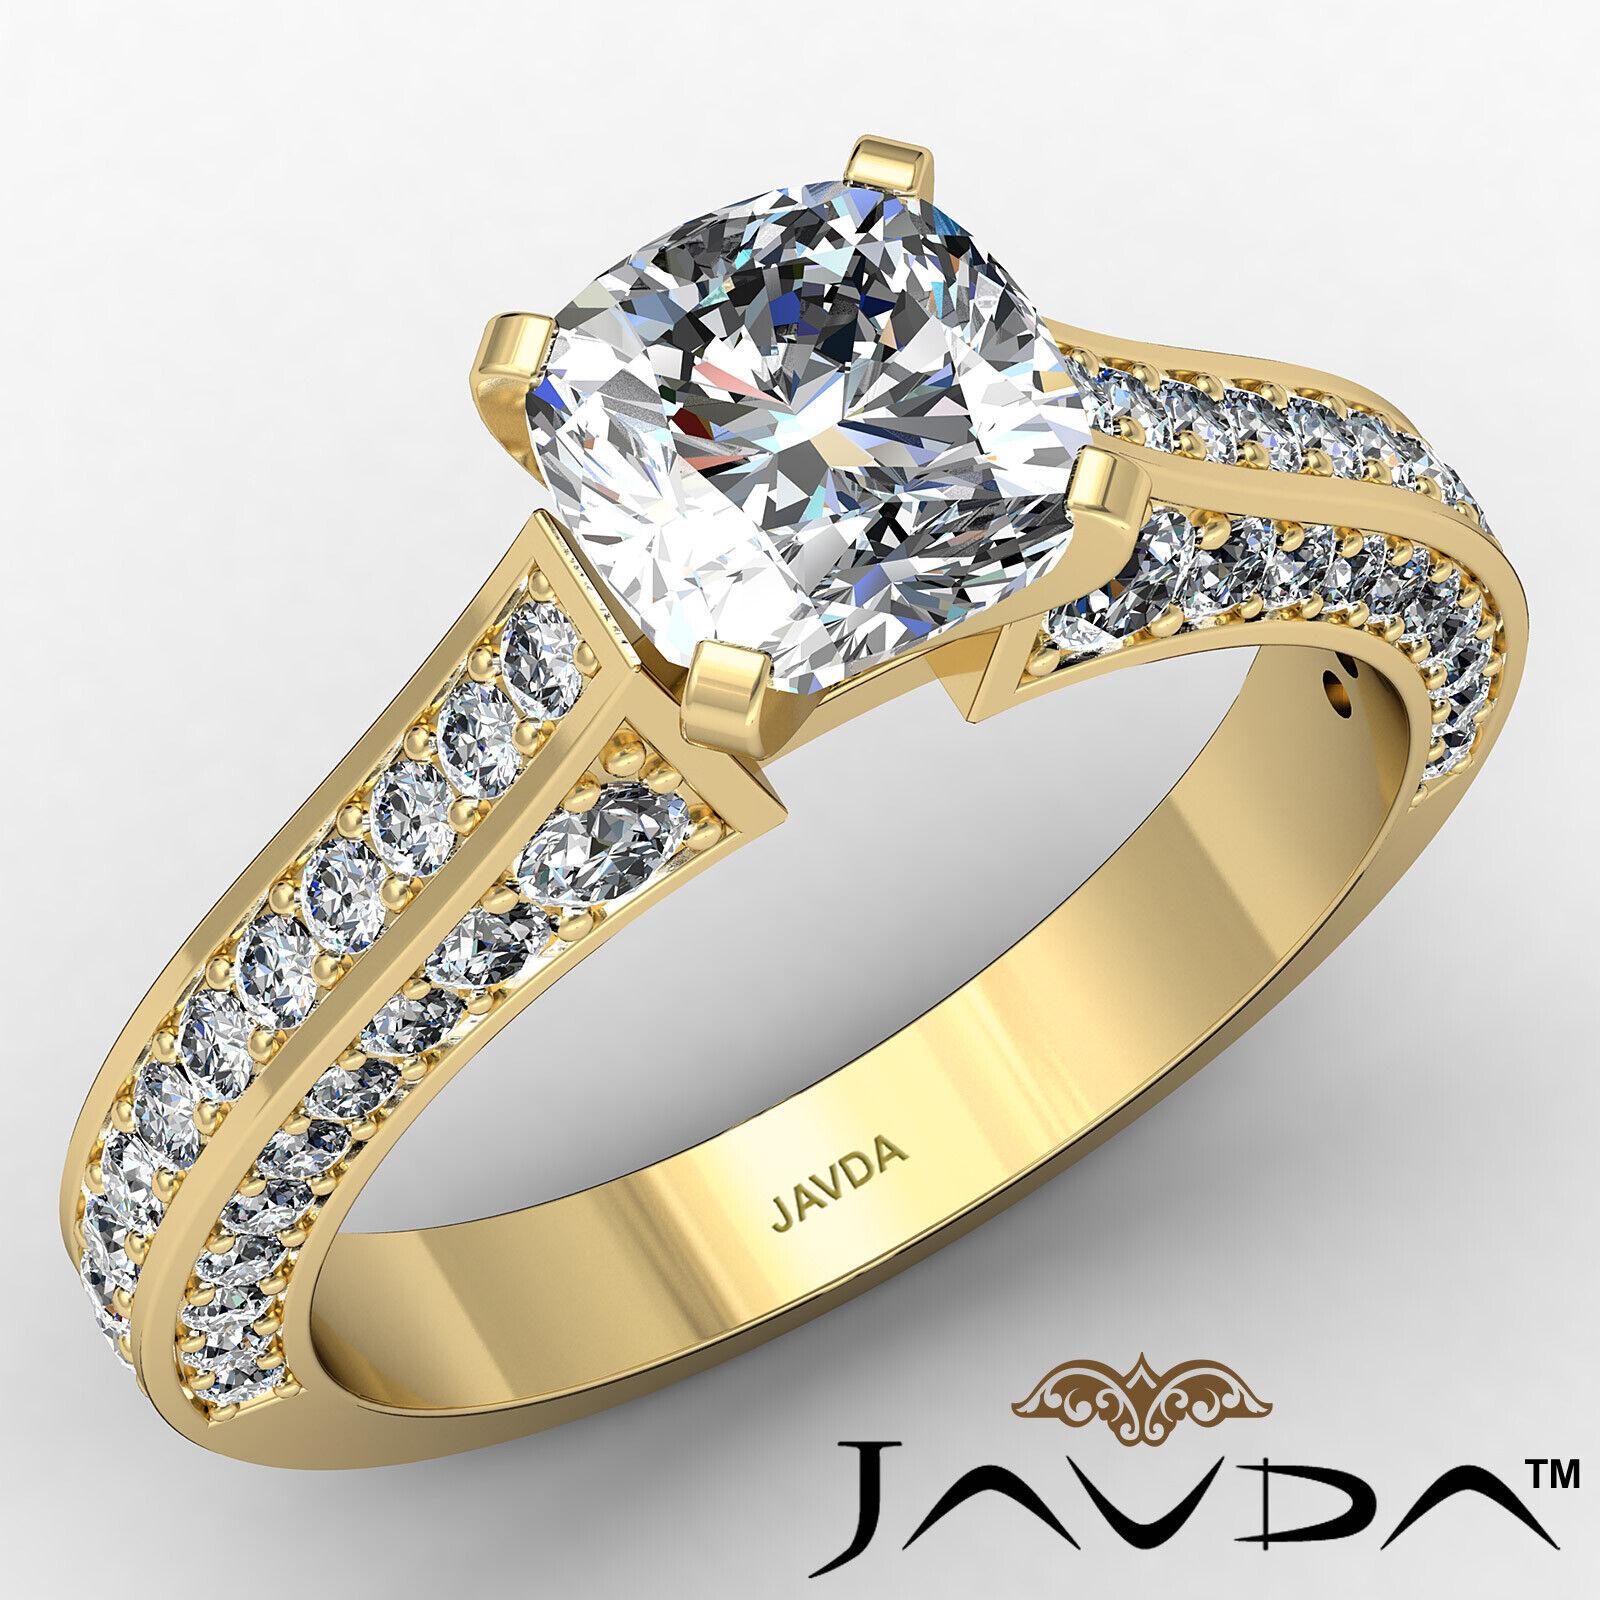 Cushion Diamond Engagement Pave Set Ring GIA J Color & VS2 clarity 1.82ctw 1